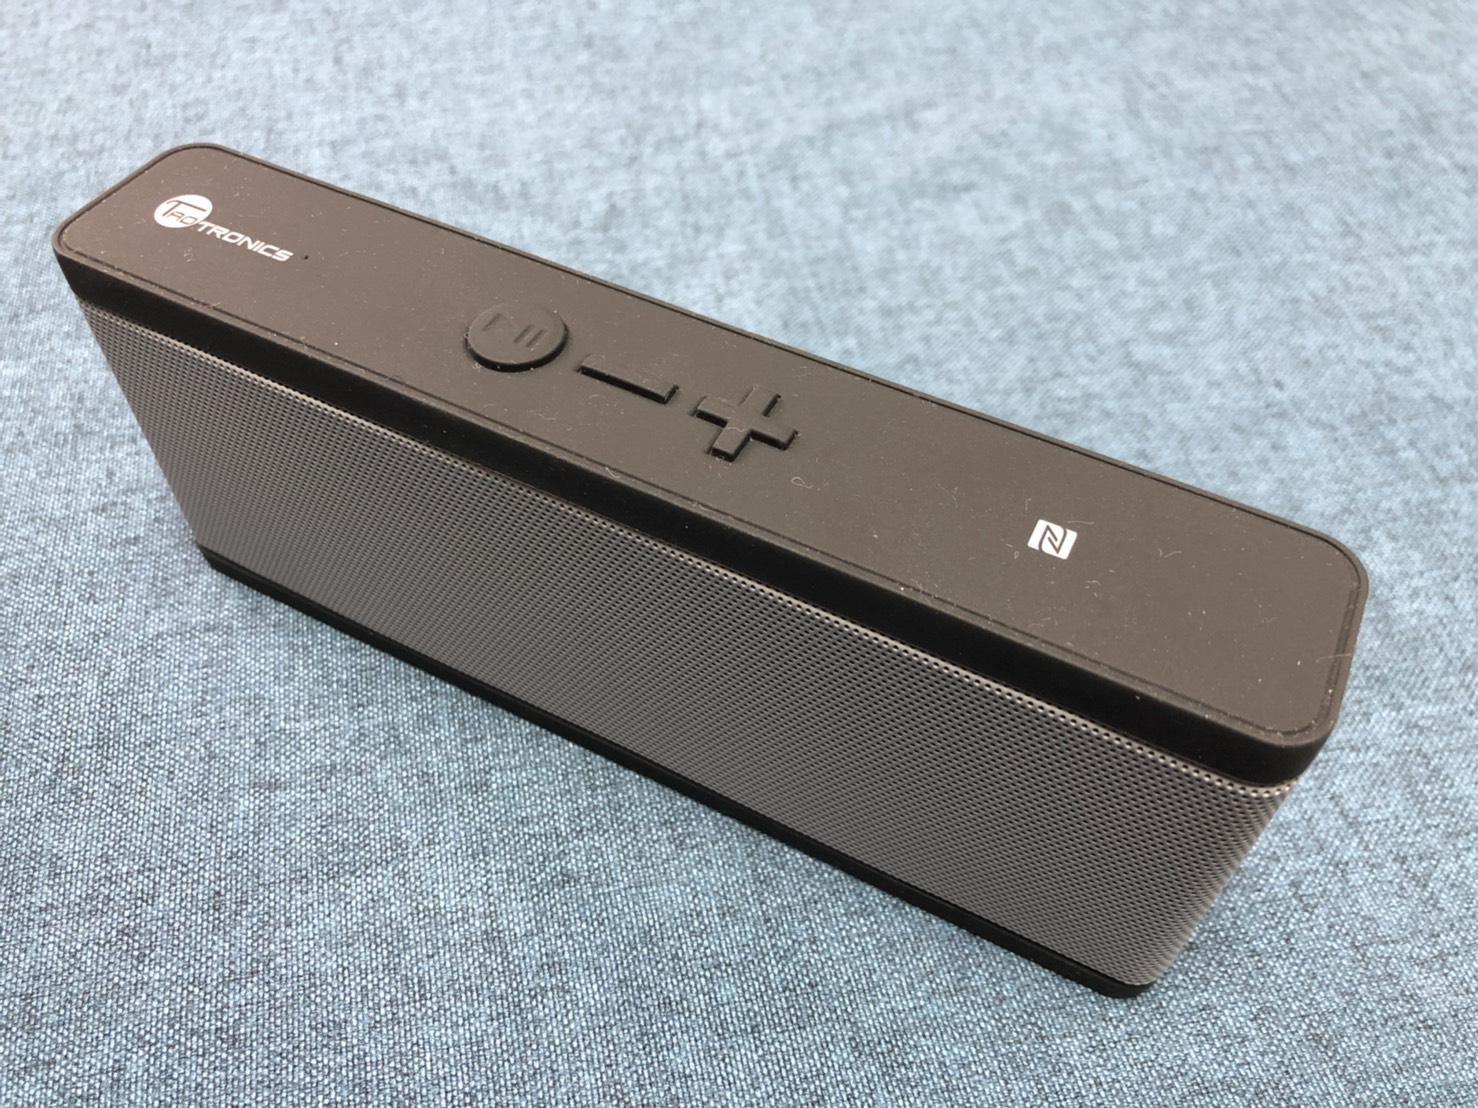 TaoTronics TT-SK09防水藍芽喇叭推薦 - NFC